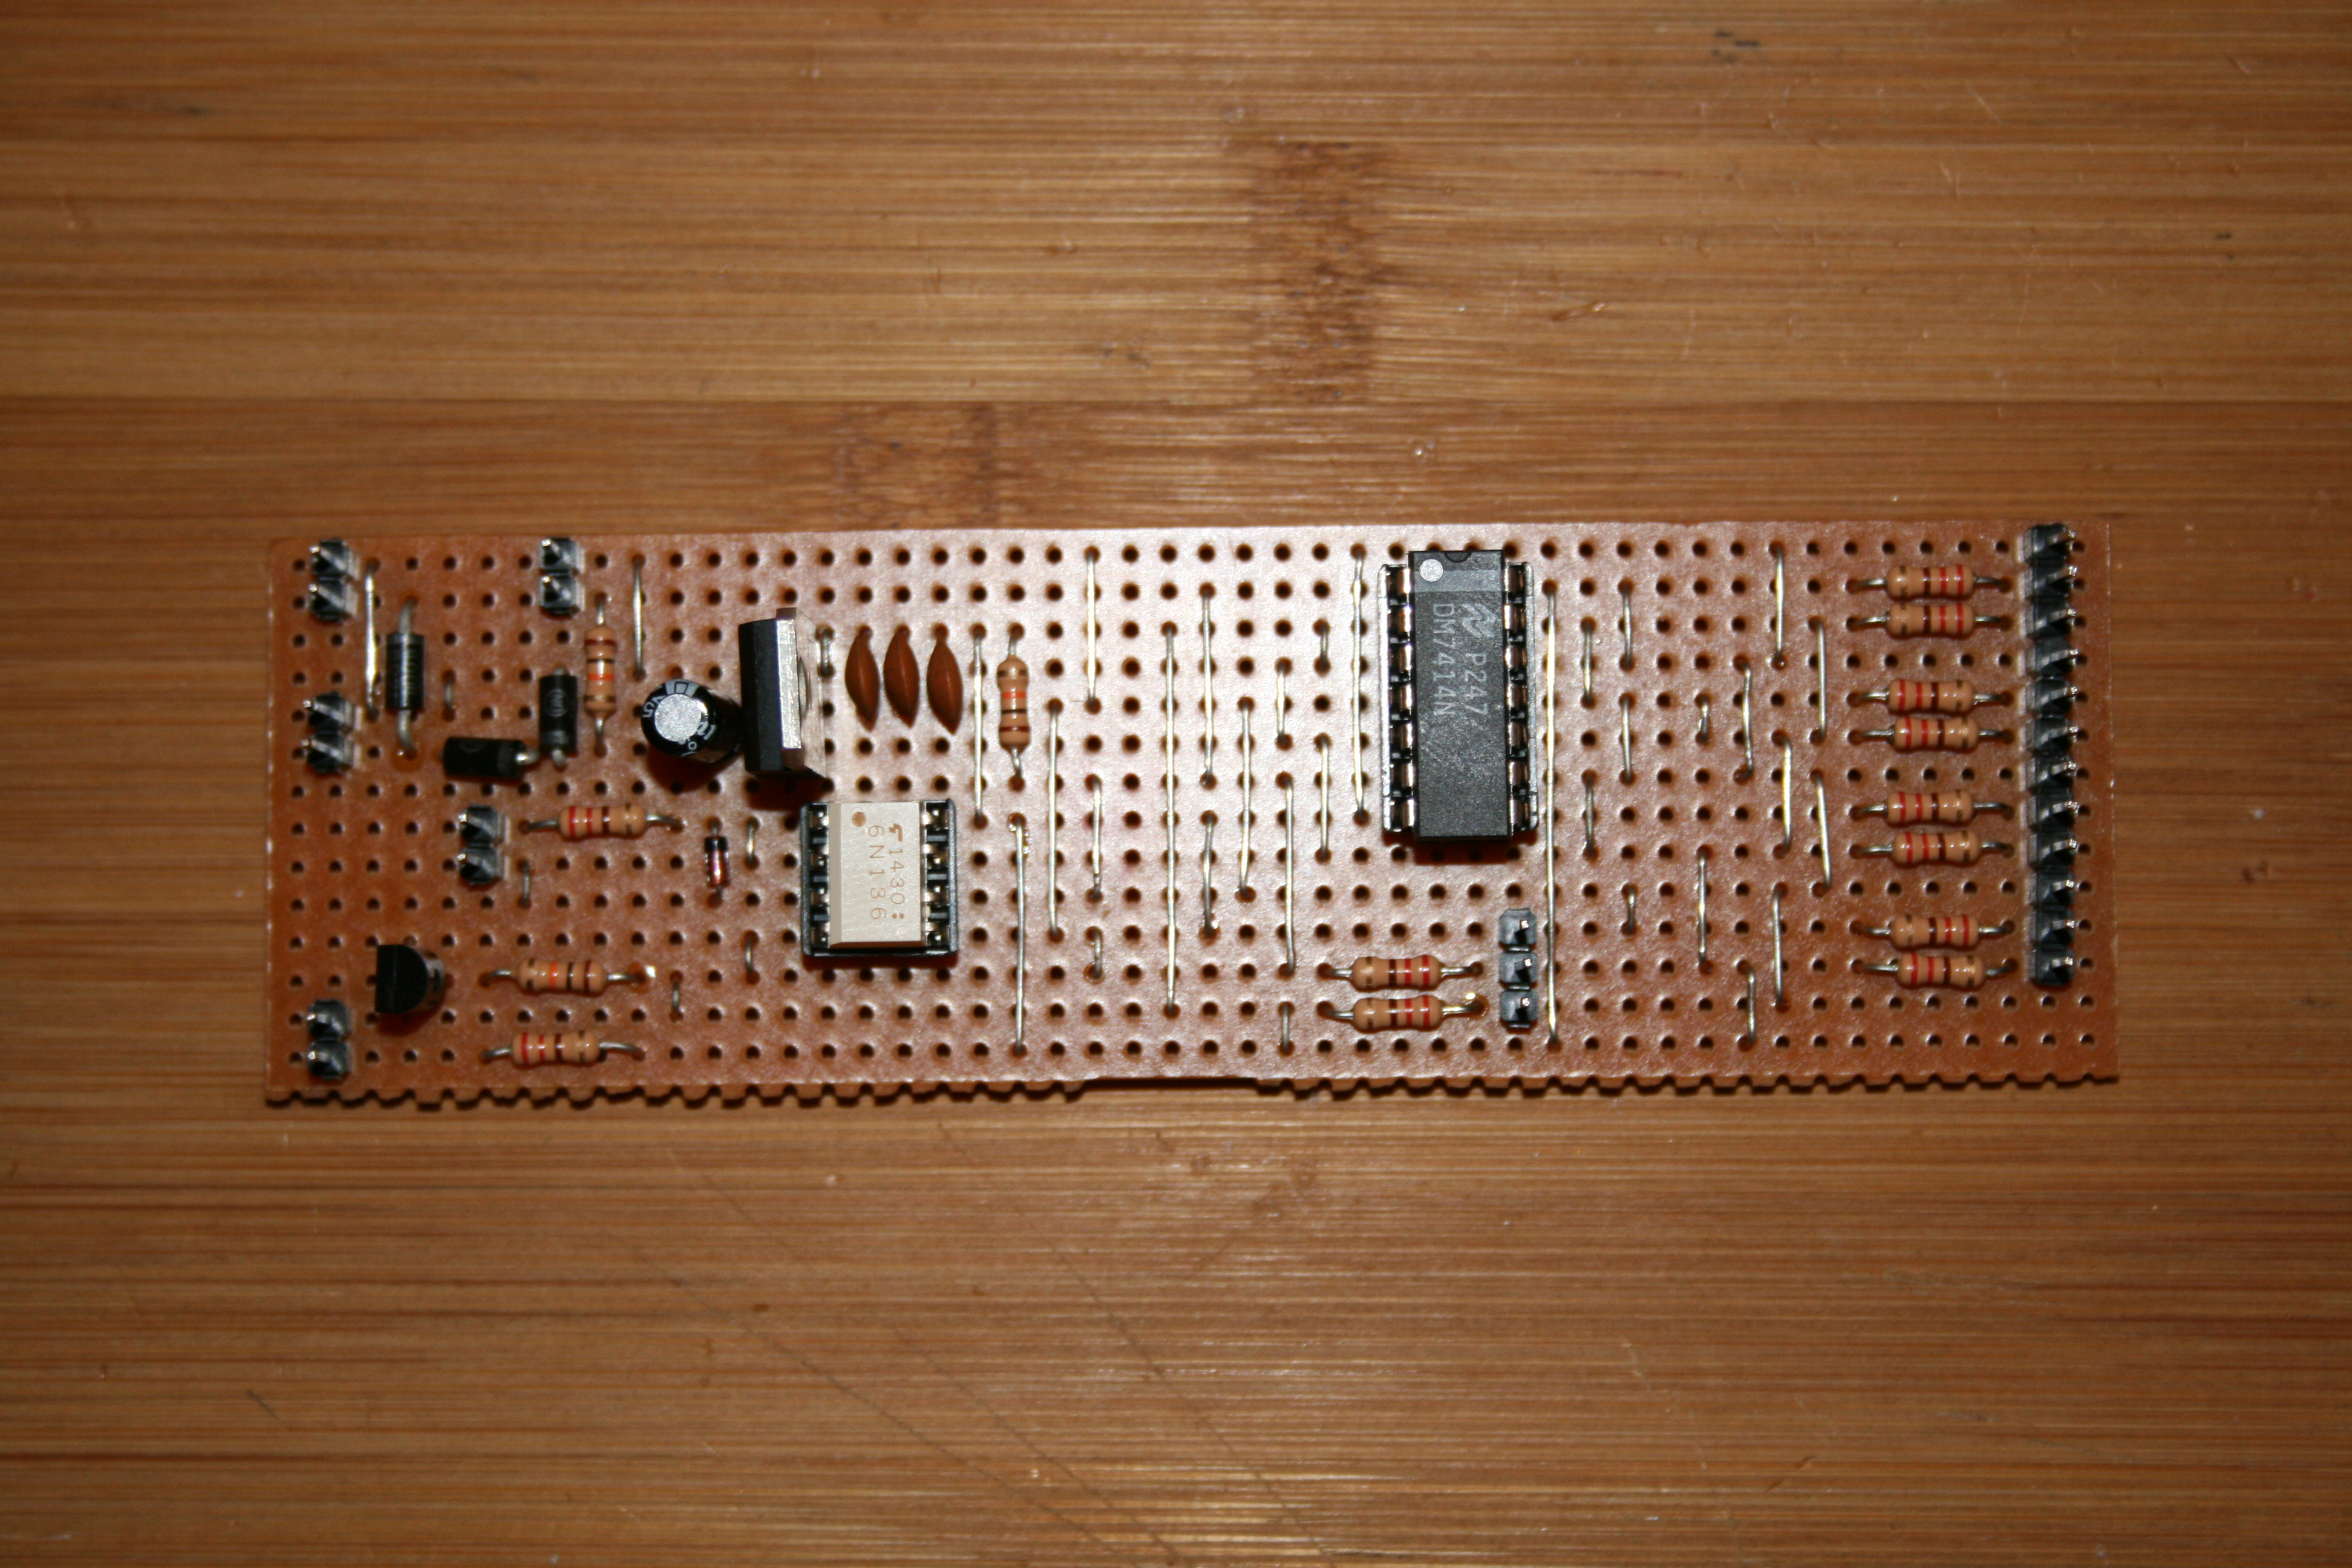 Diy Midi Thru Box Morocco Dave Doityourself Customized Circuit Board Pcb Making Do It Boxing Up